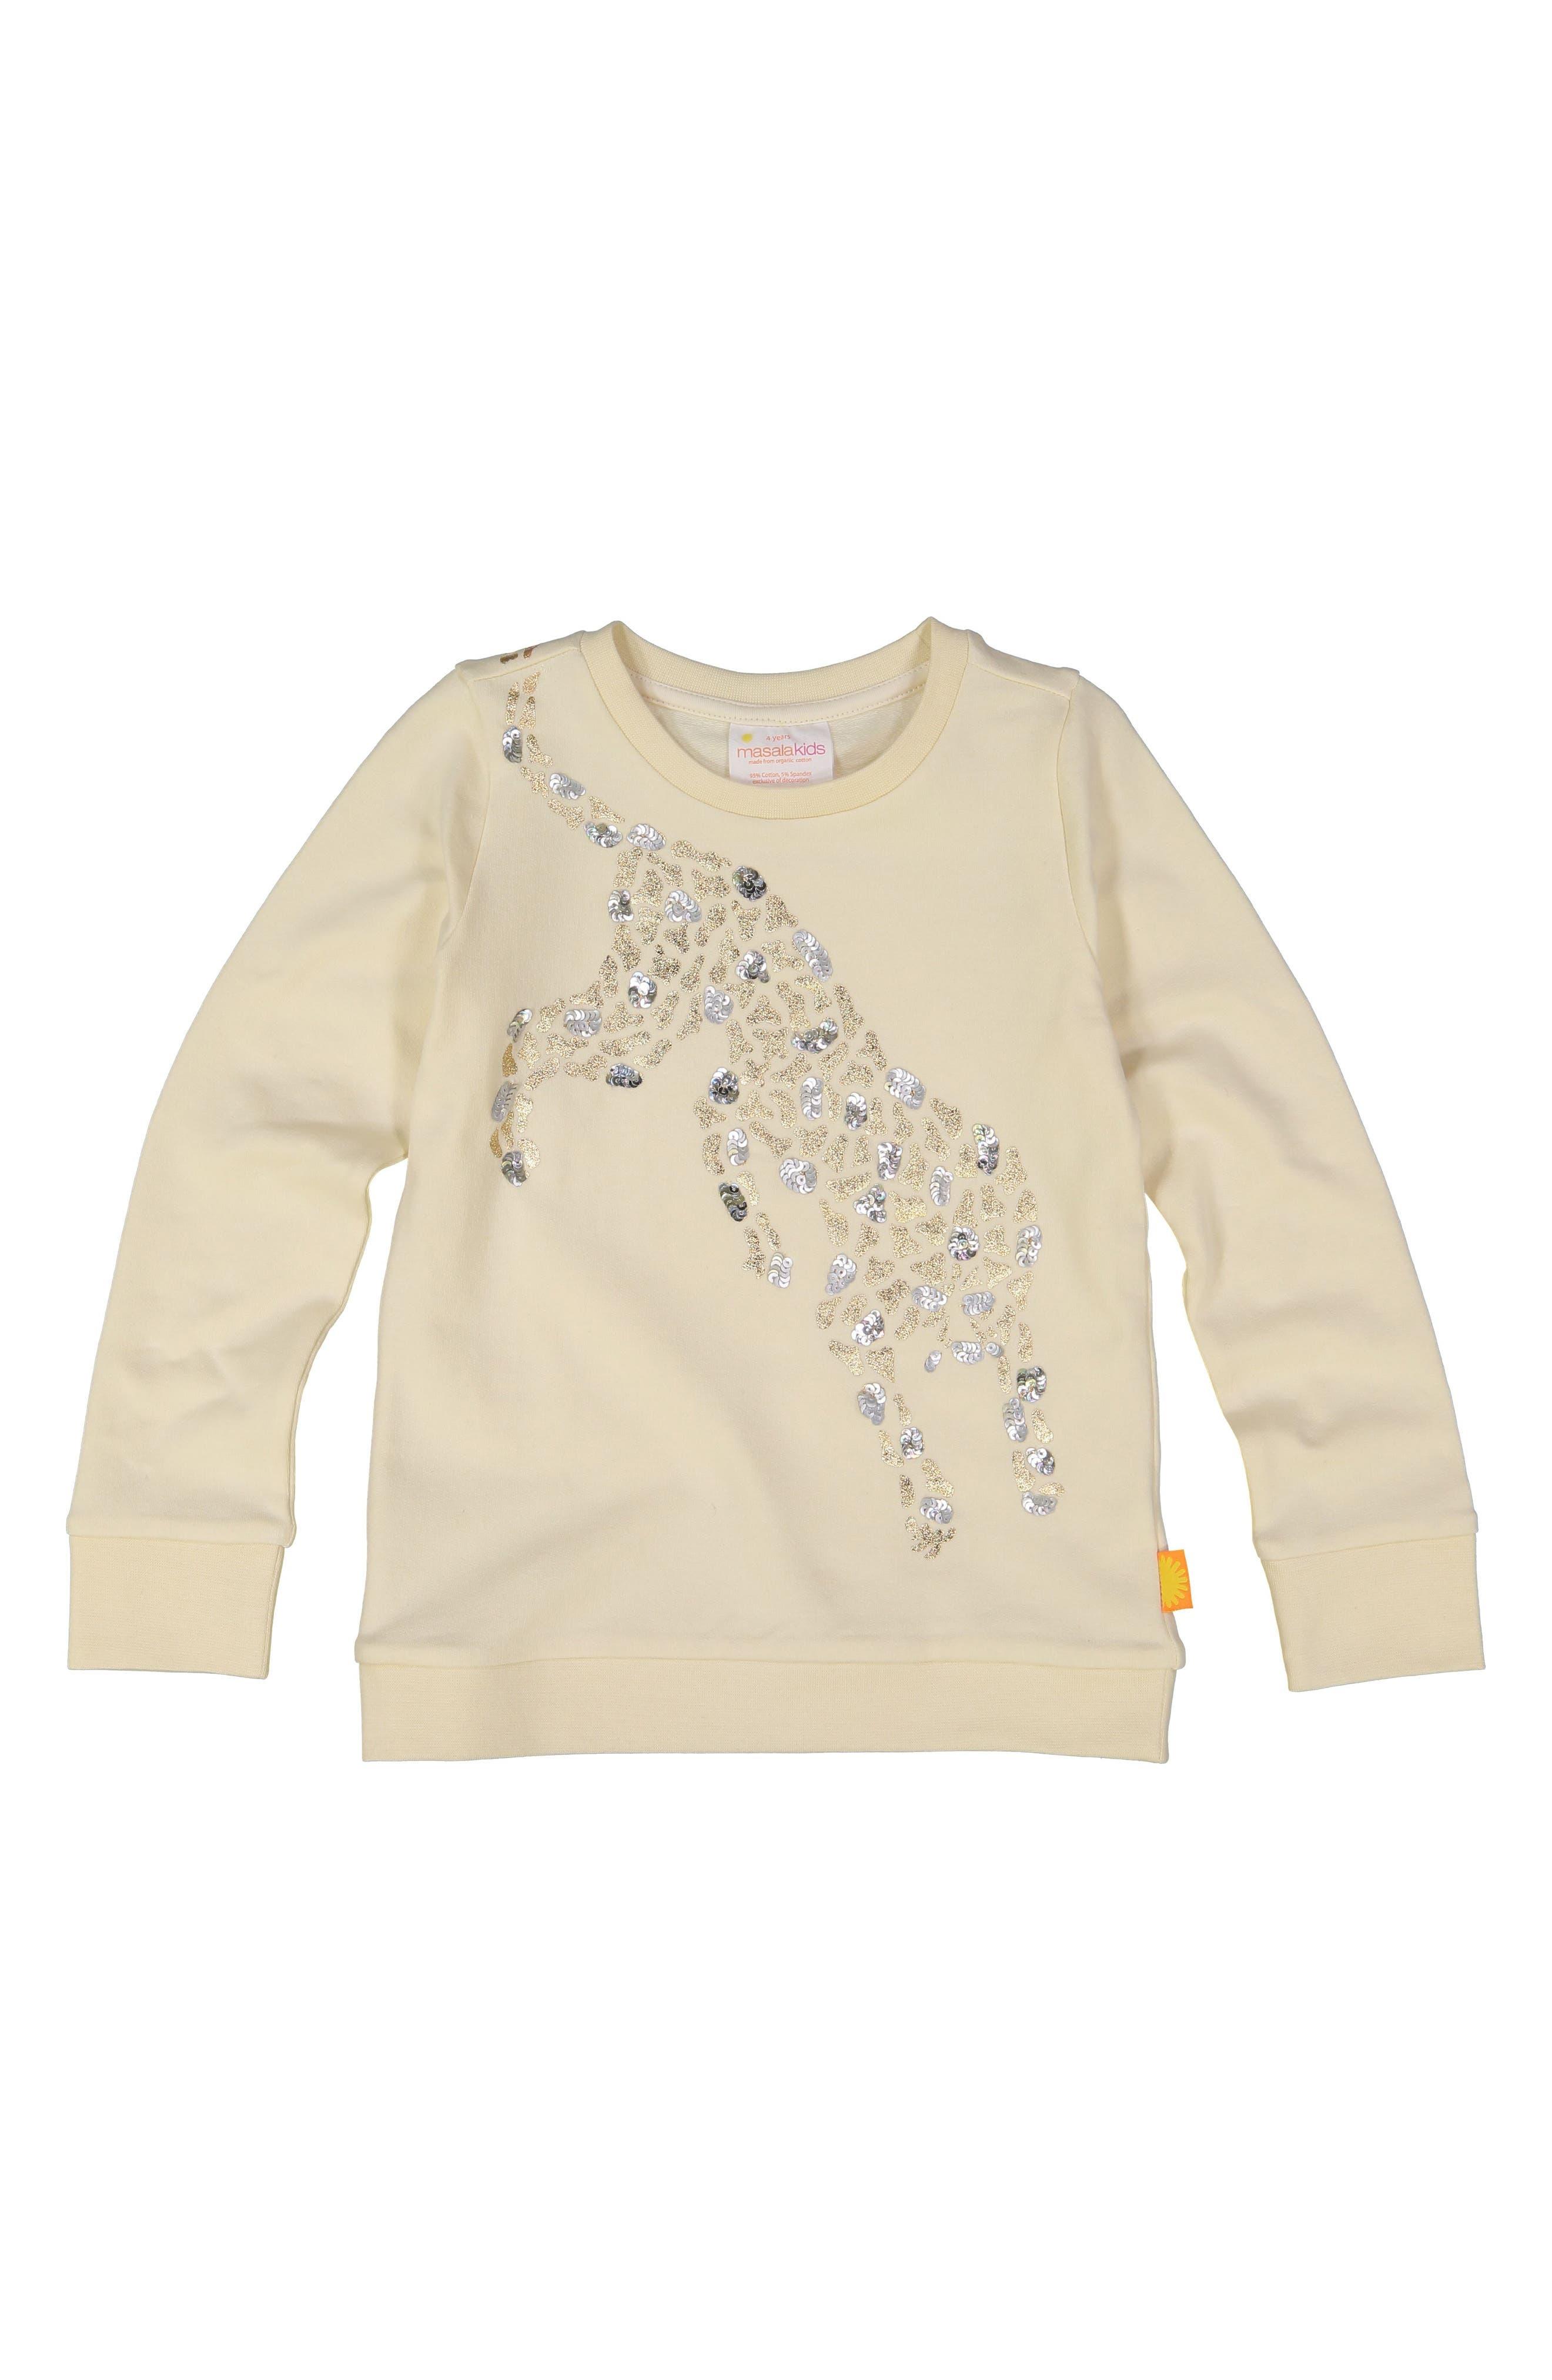 Cheetah Organic Cotton Sweatshirt,                         Main,                         color, 100